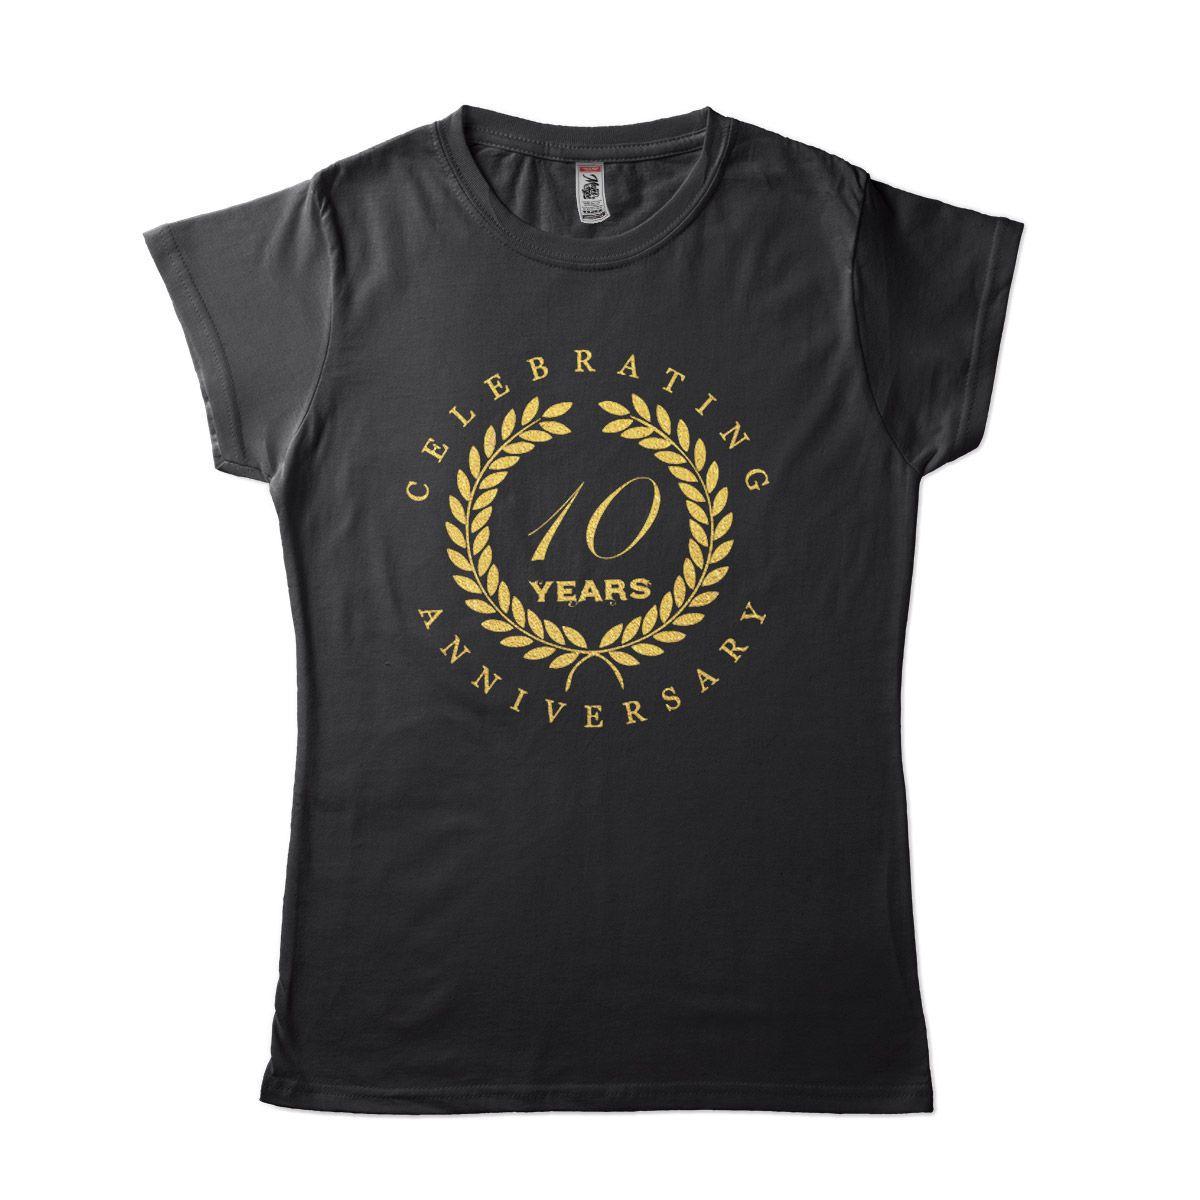 camiseta comemorativa casamento namoro 10 anos personalizada